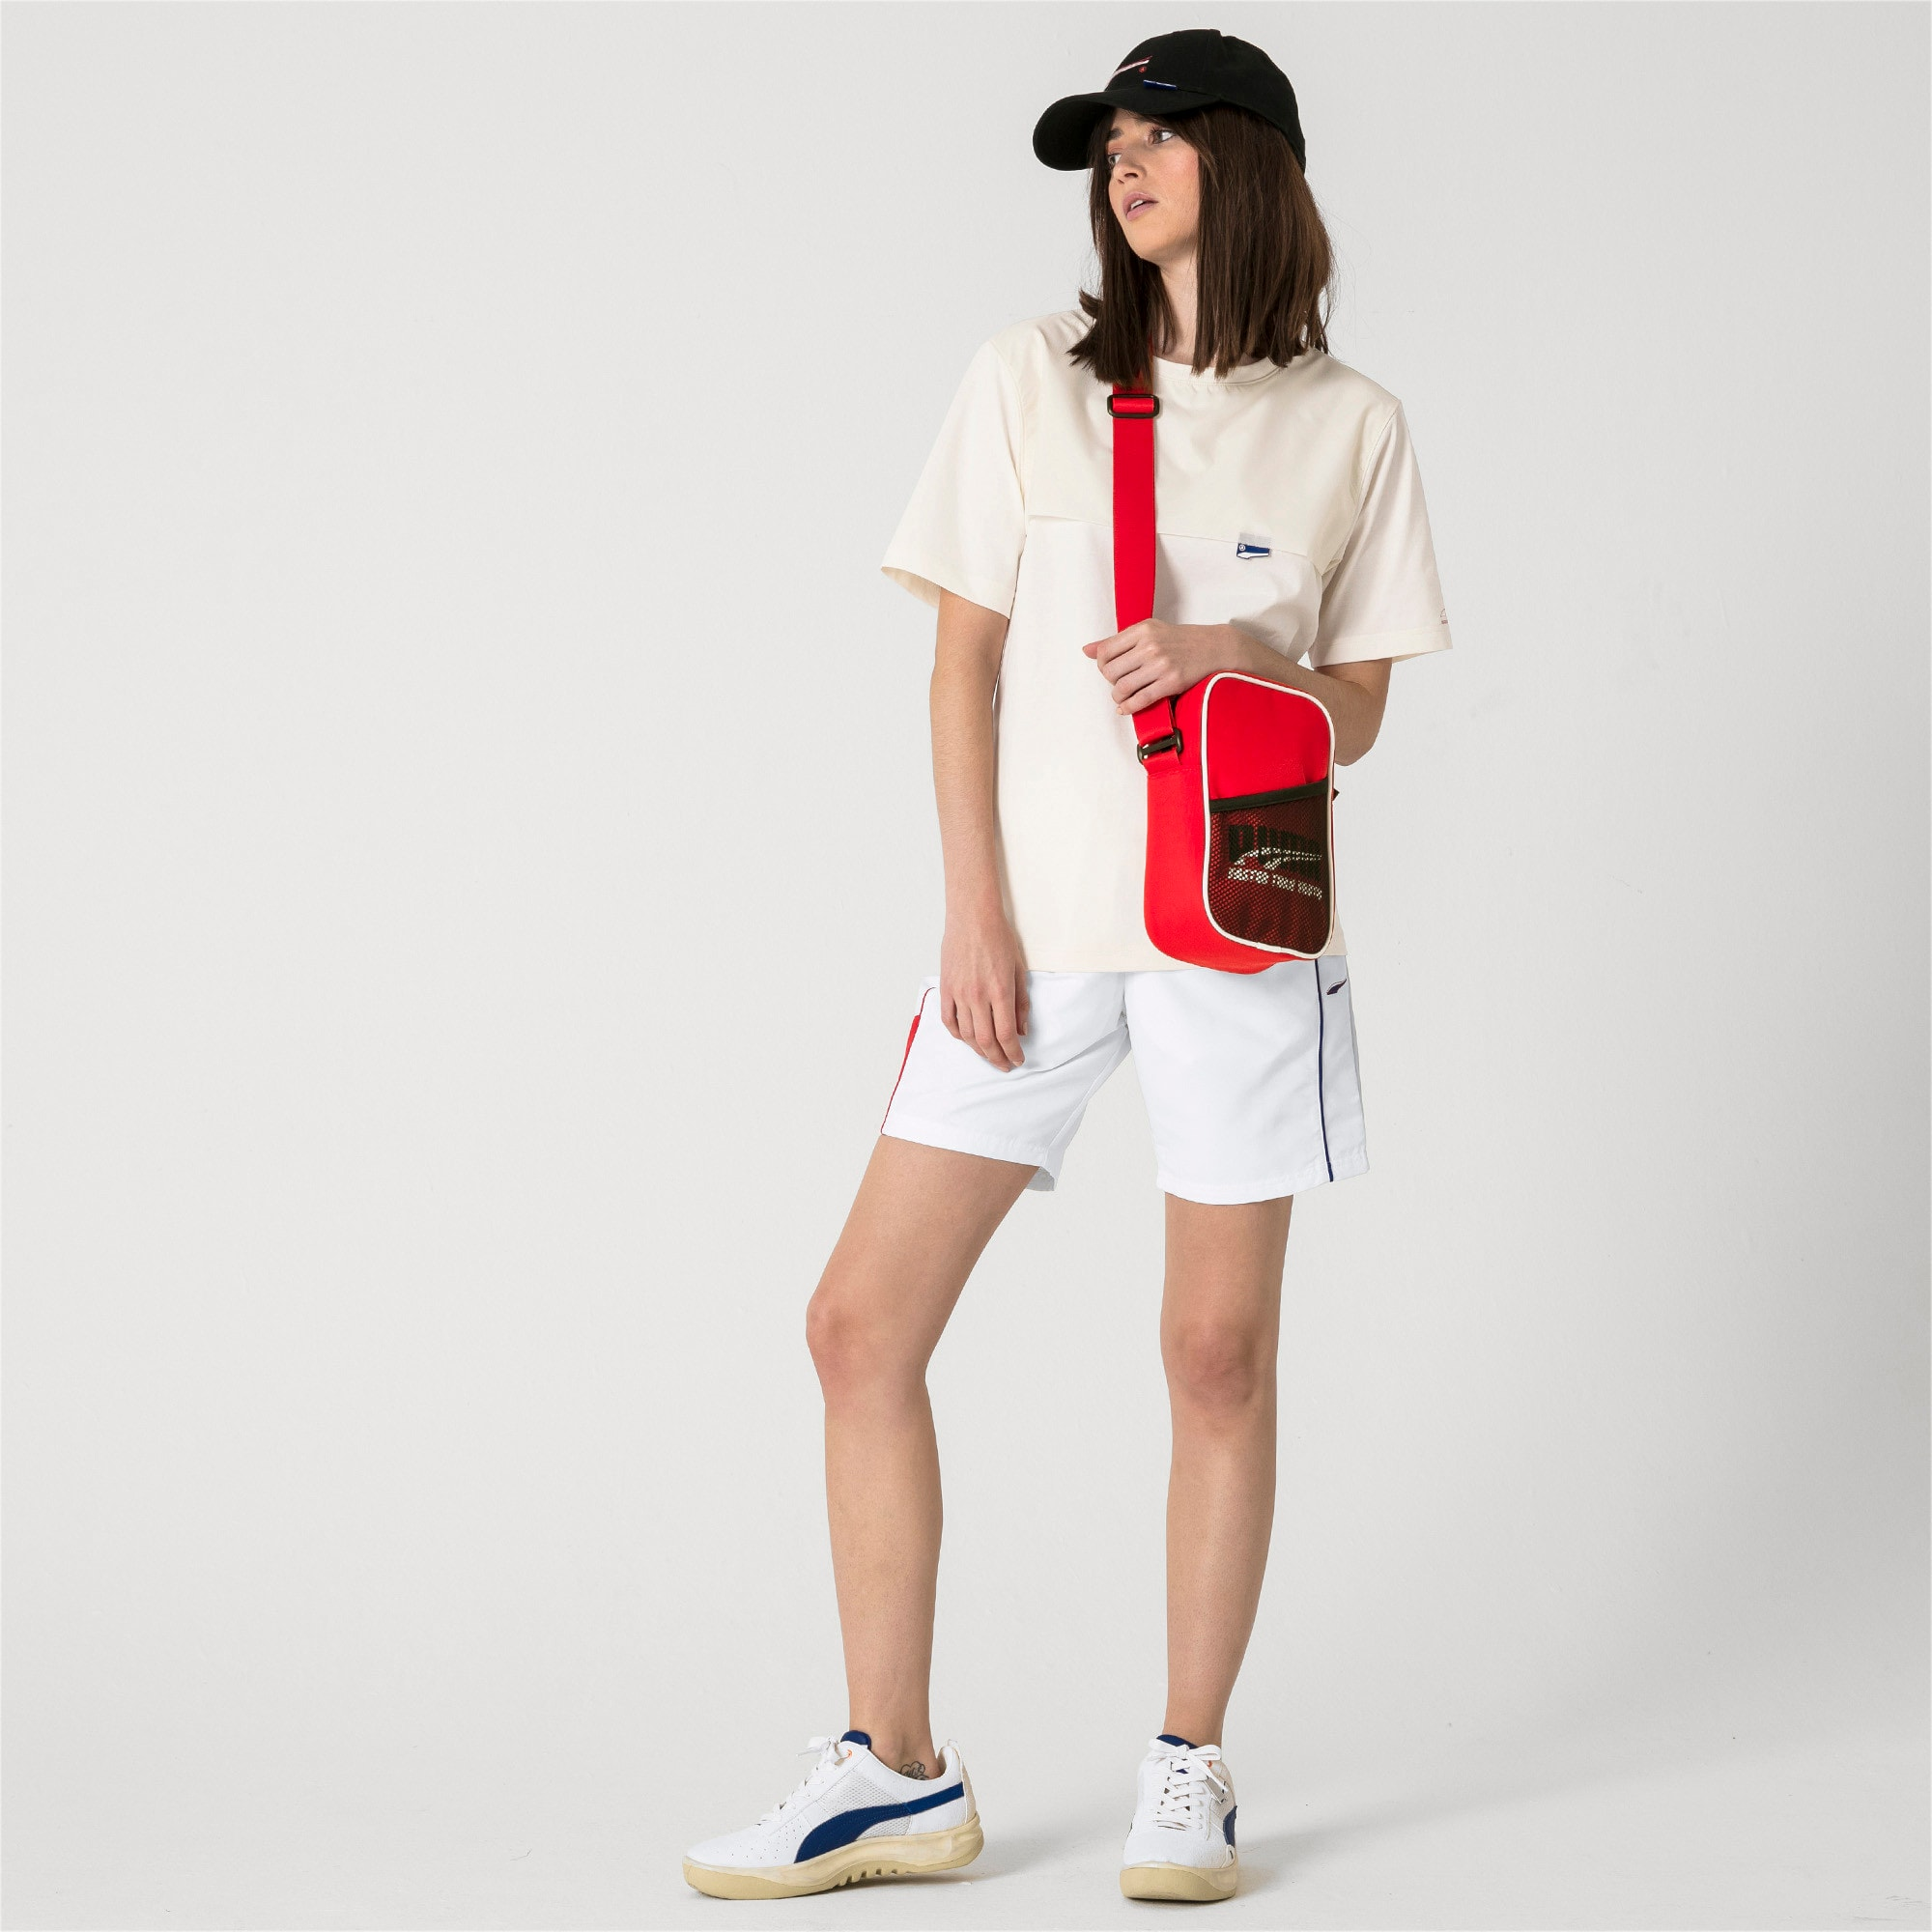 Thumbnail 7 of PUMA x ADER ERROR Portable Bag, Puma Red, medium